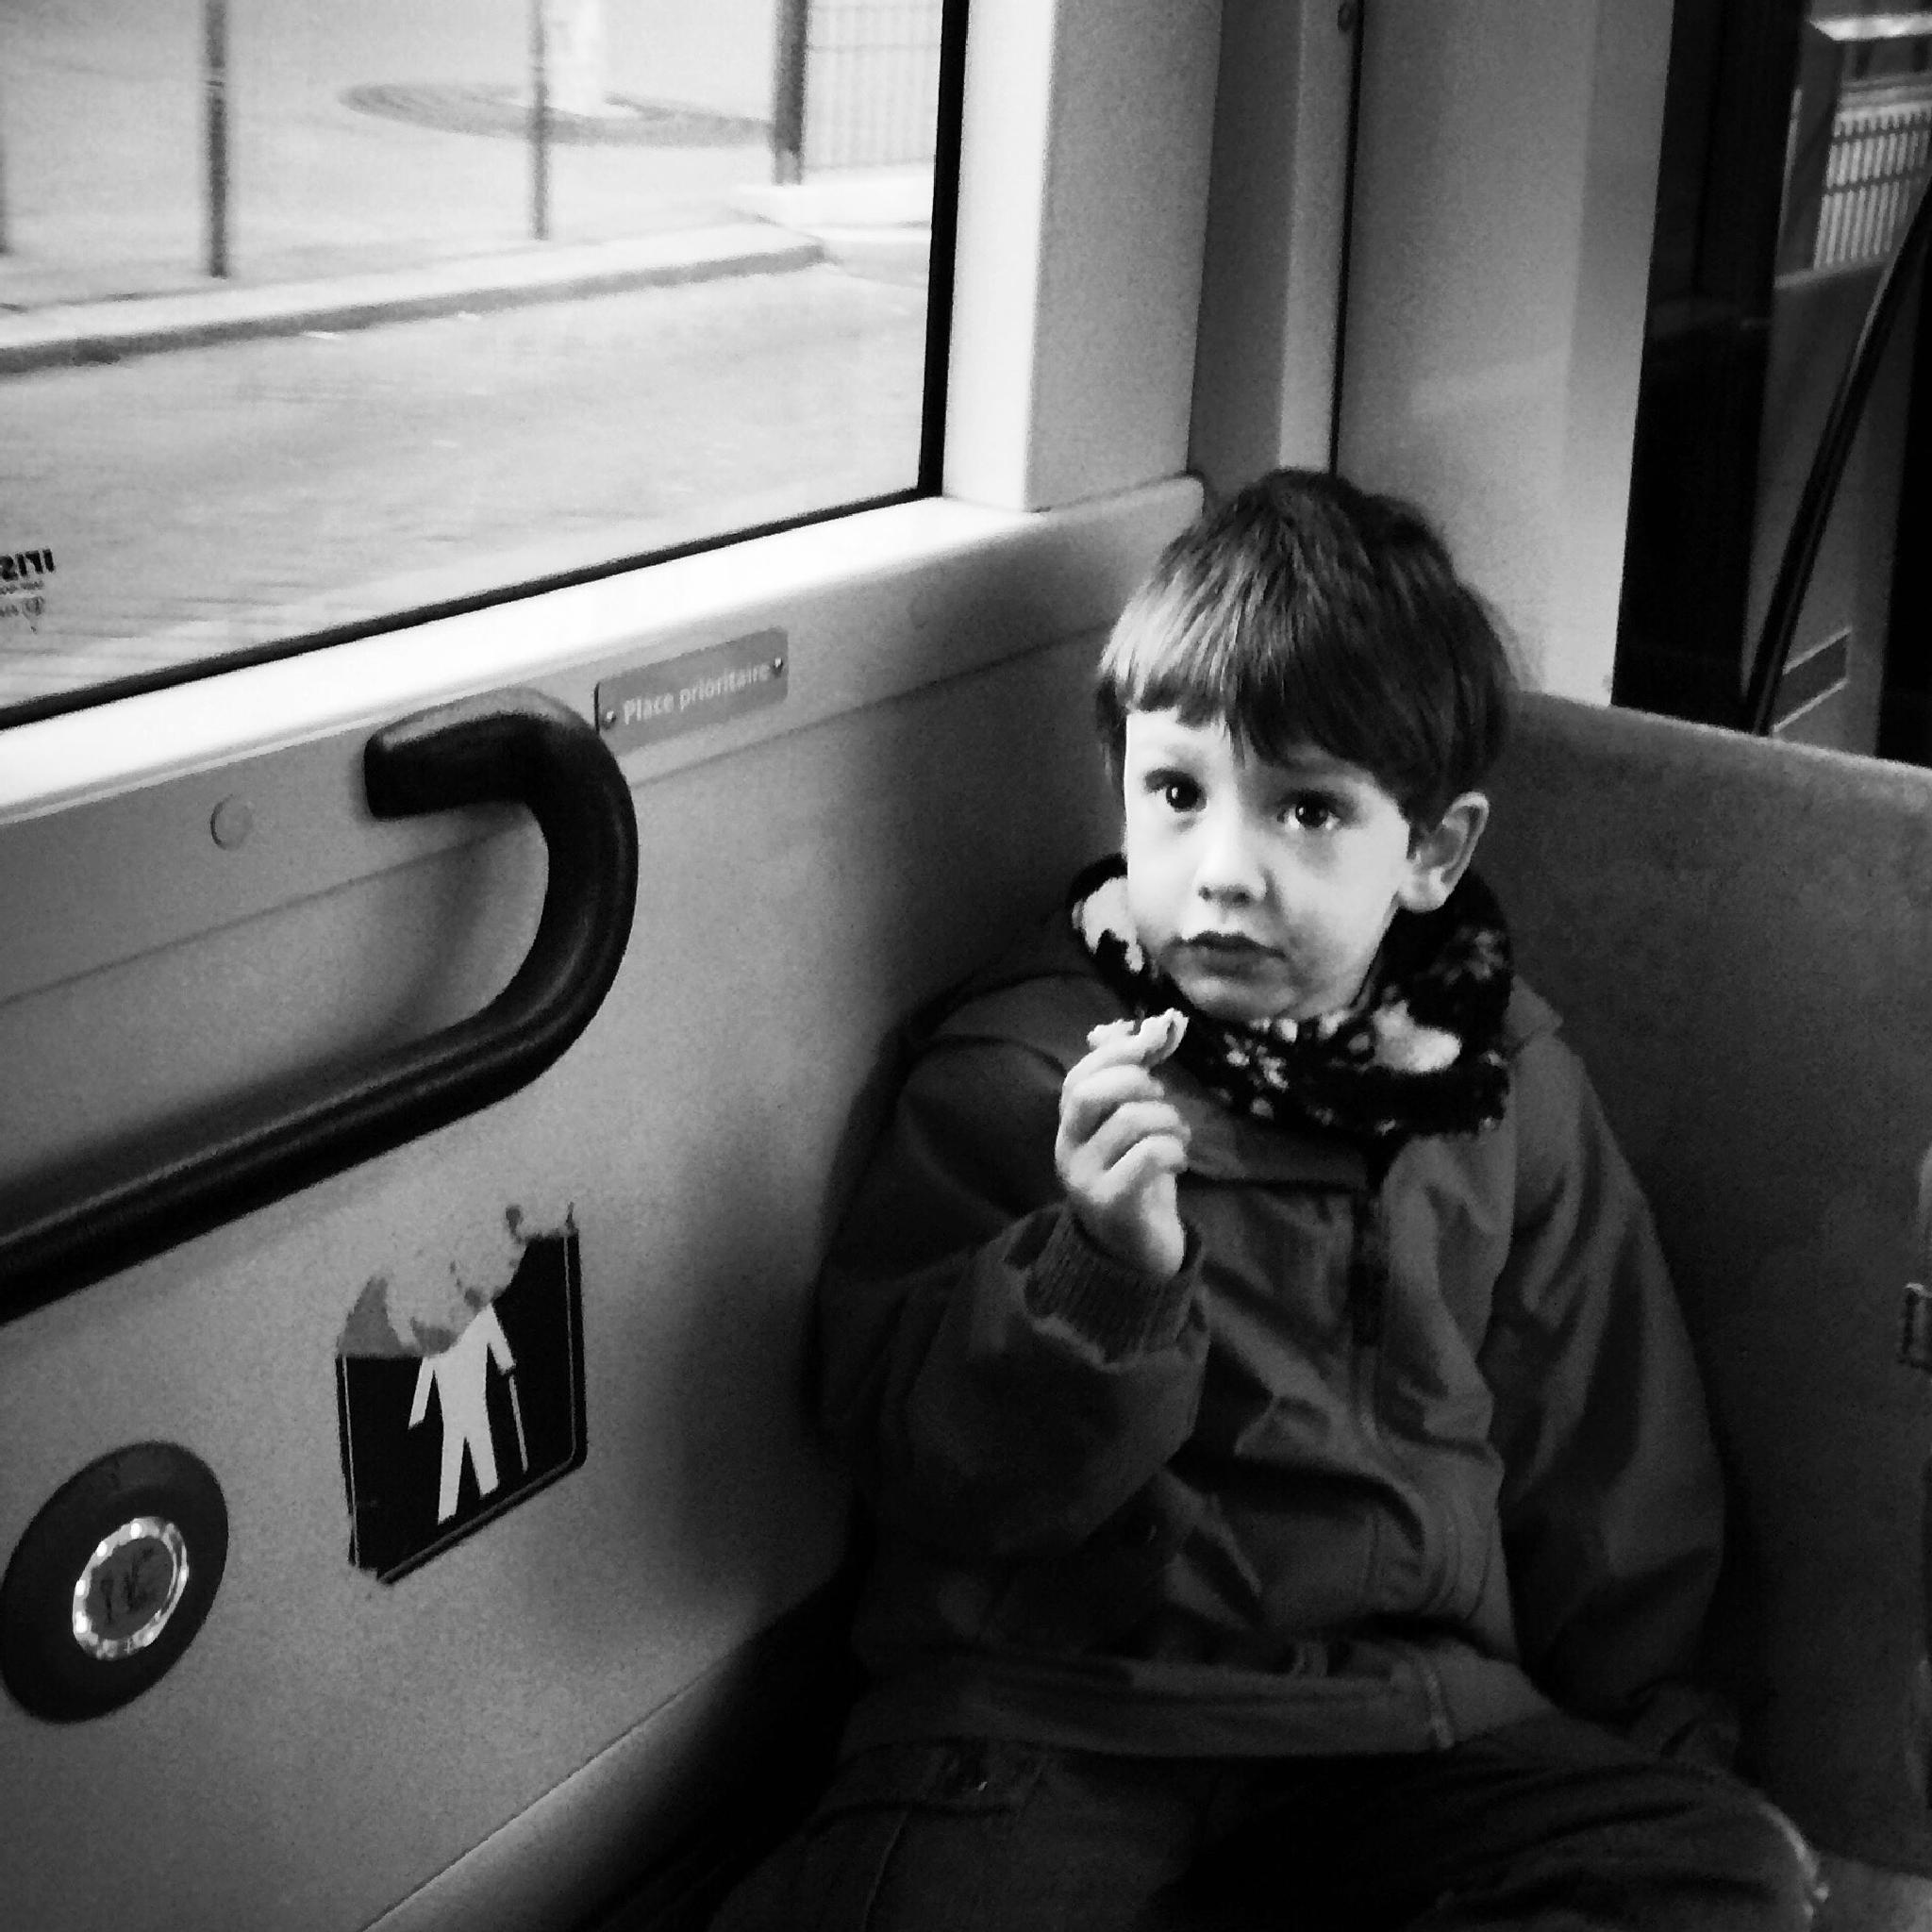 Kid bus snack by parisfind